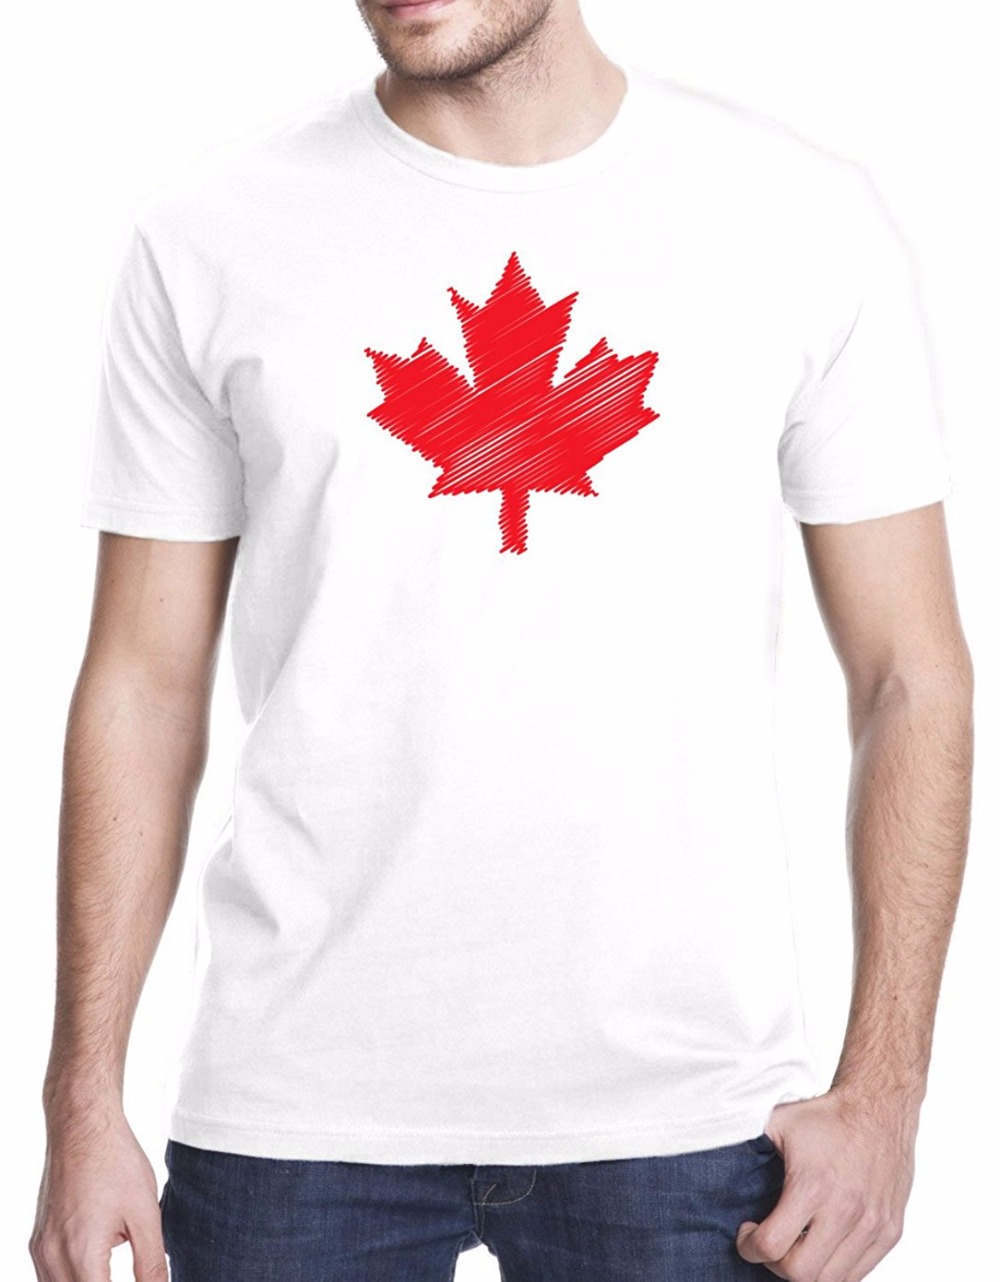 Shirt design canada - 2017 Hip Hop Novelty T Shirts Men S Brand Clothing Canada Maple Leaf Scribble Design Men S O